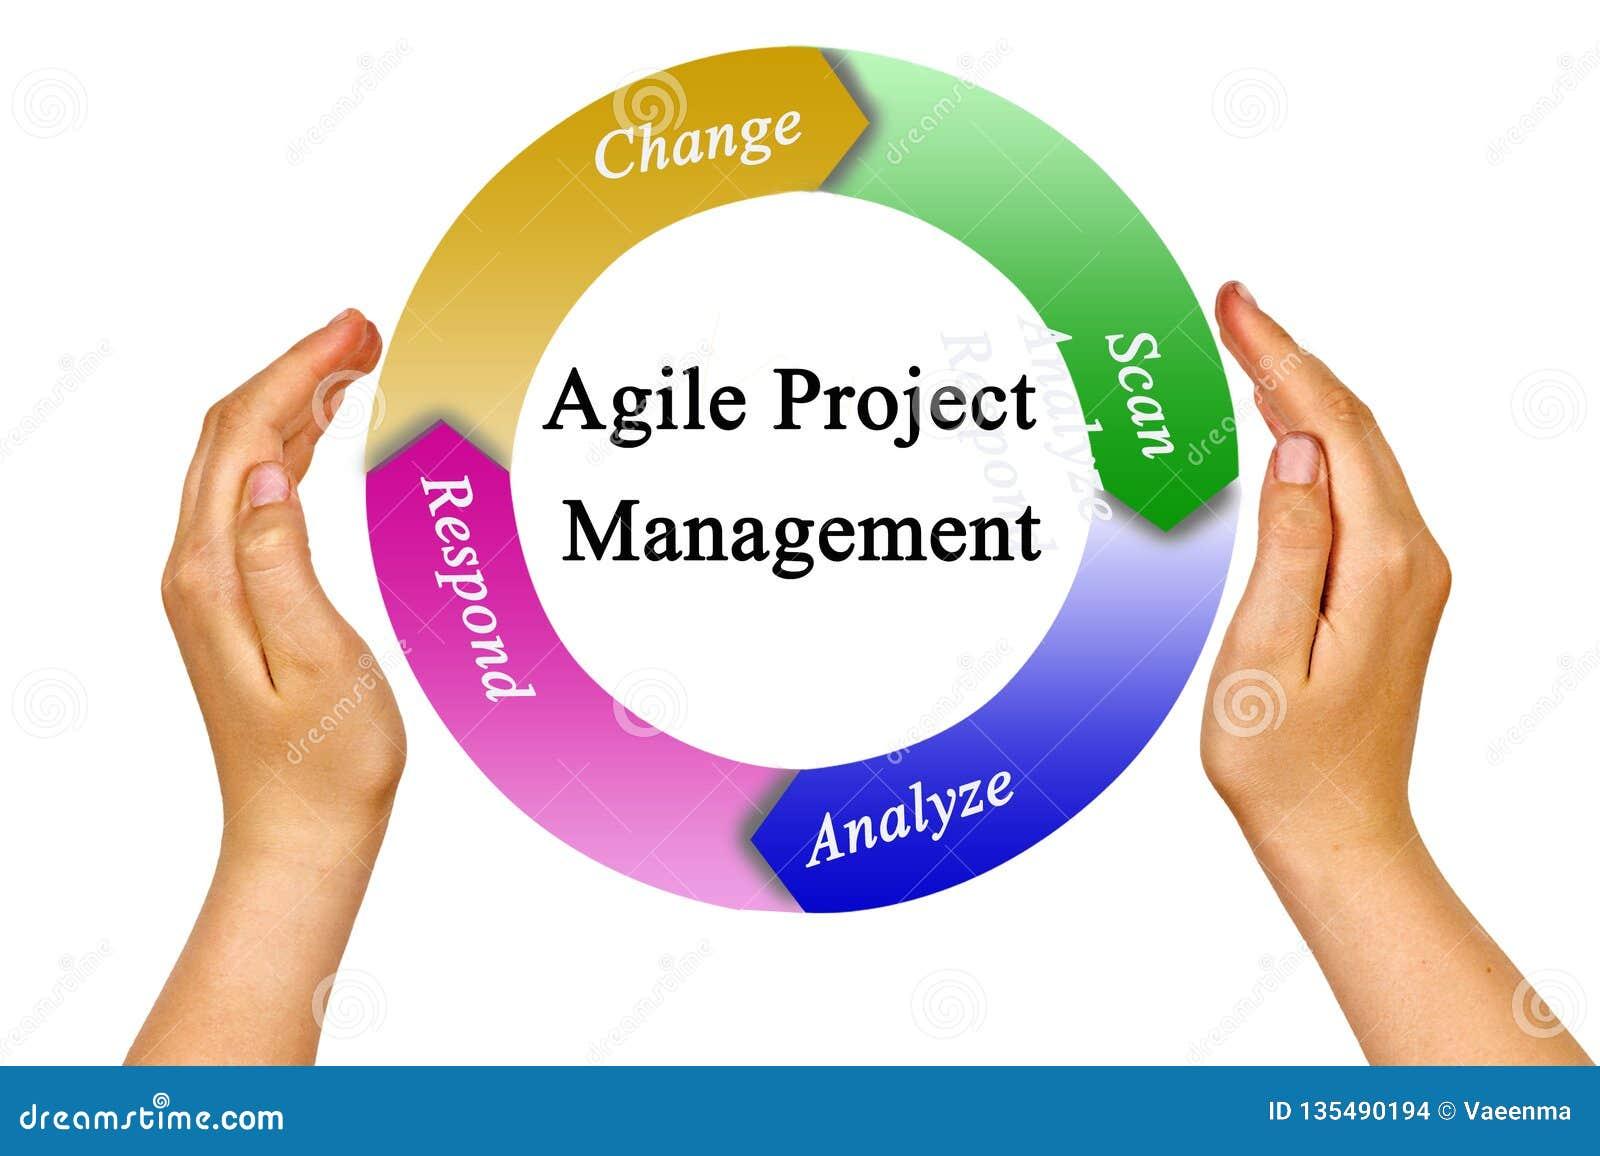 Agile Management agile project management stock photo. image of respond